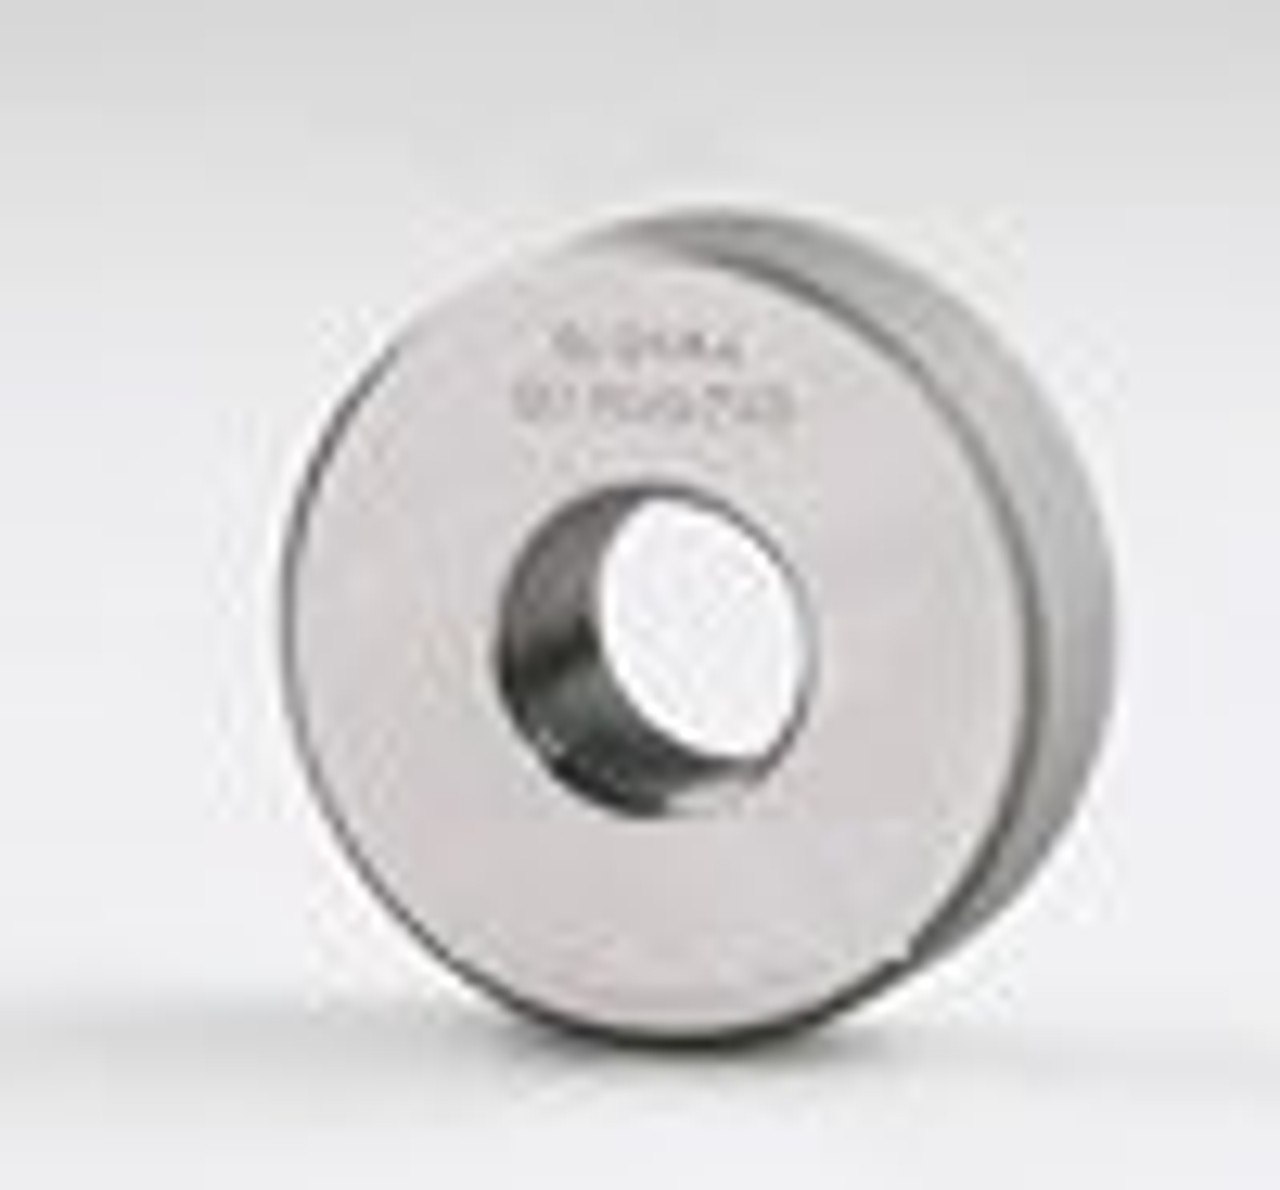 "BSW 1-1/2"" - 6 GO Thread Ring Gauge - (BSW1-1/2RG-GO)"